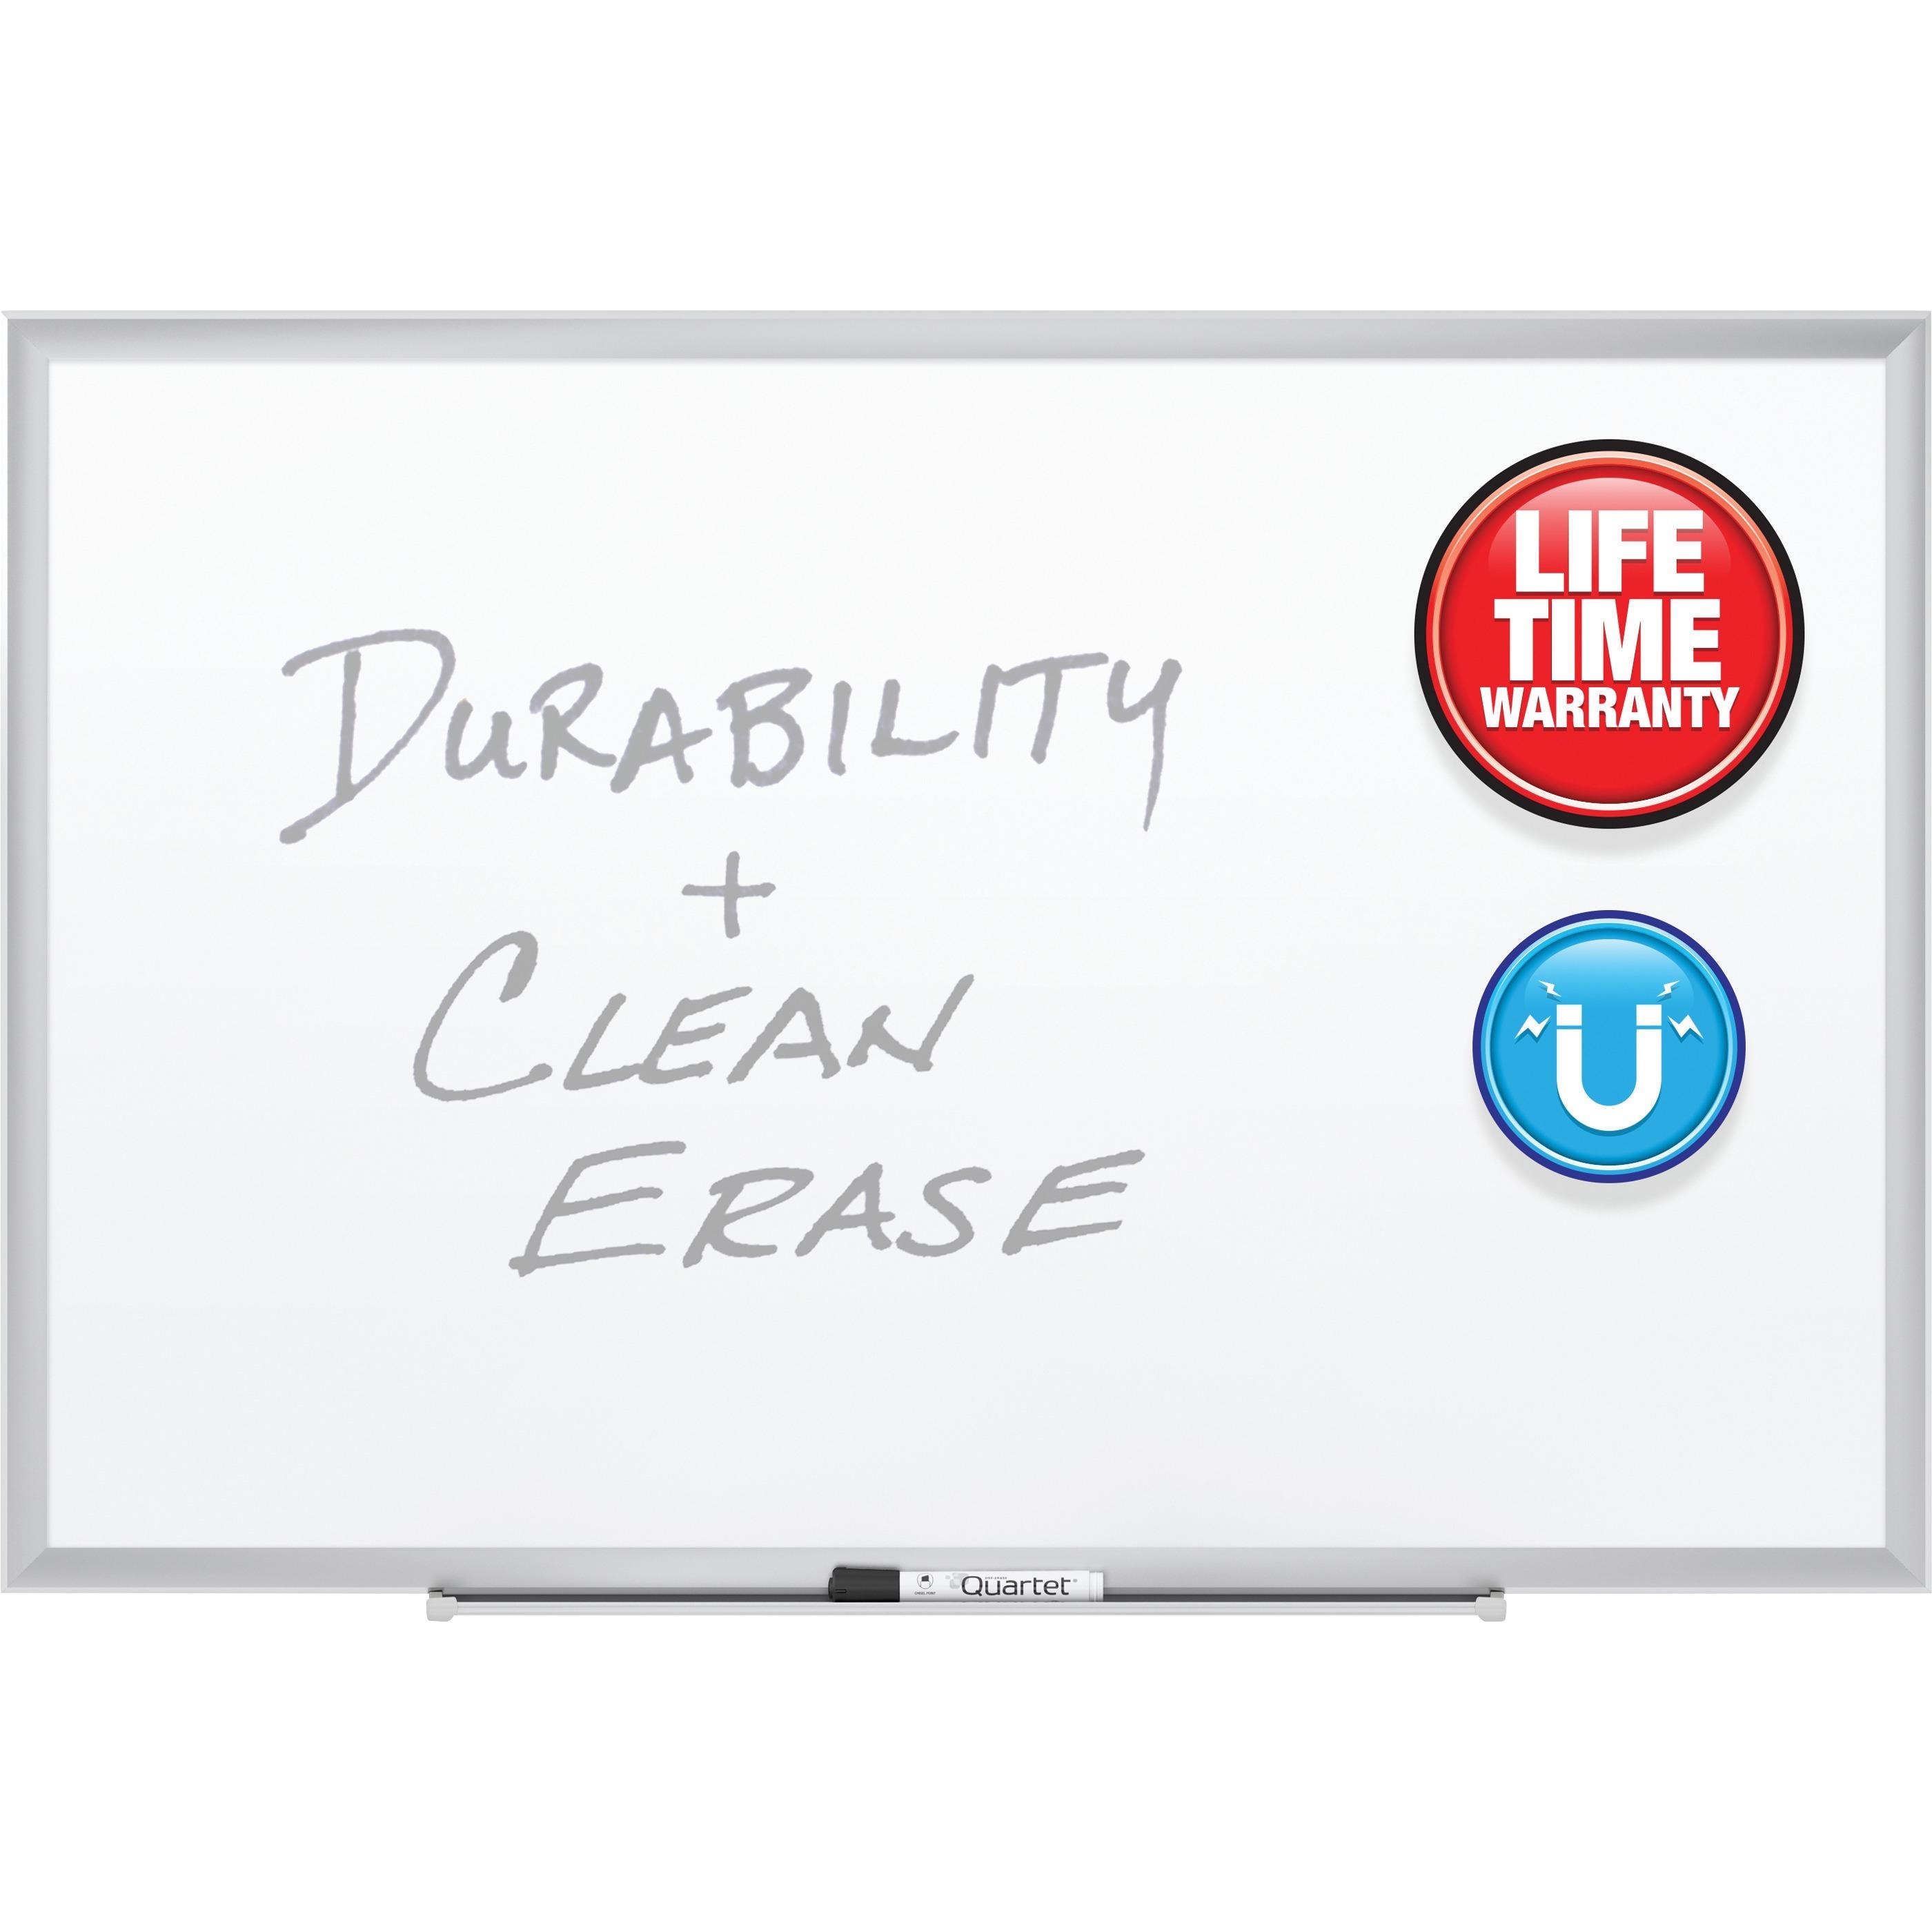 Quartet Premium DuraMax Porcelain Magnetic Whiteboard, 3' x 2', Silver Aluminum Frame